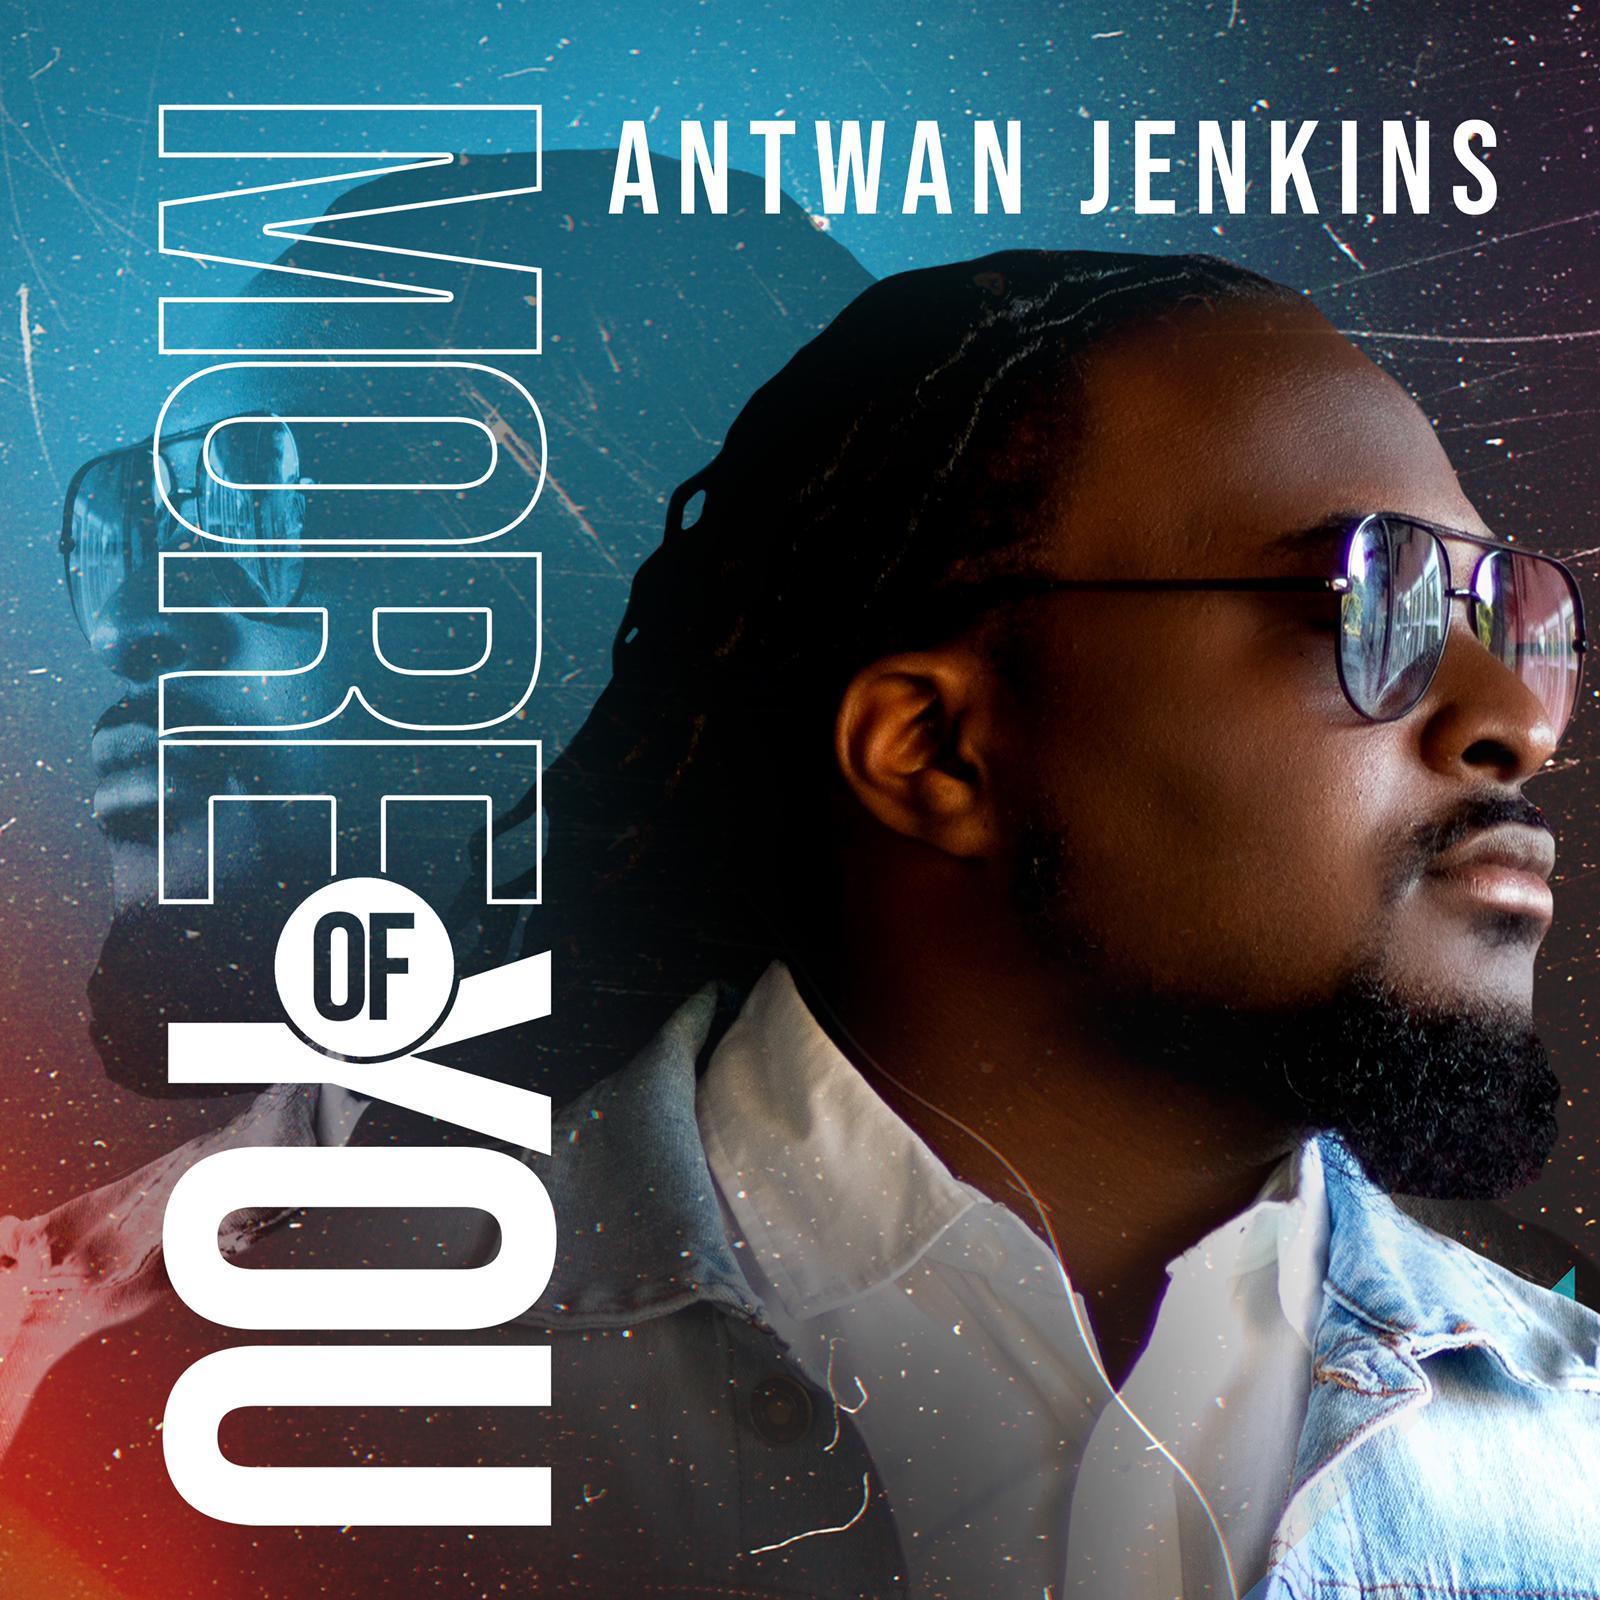 Antwan Jenkins - More of You